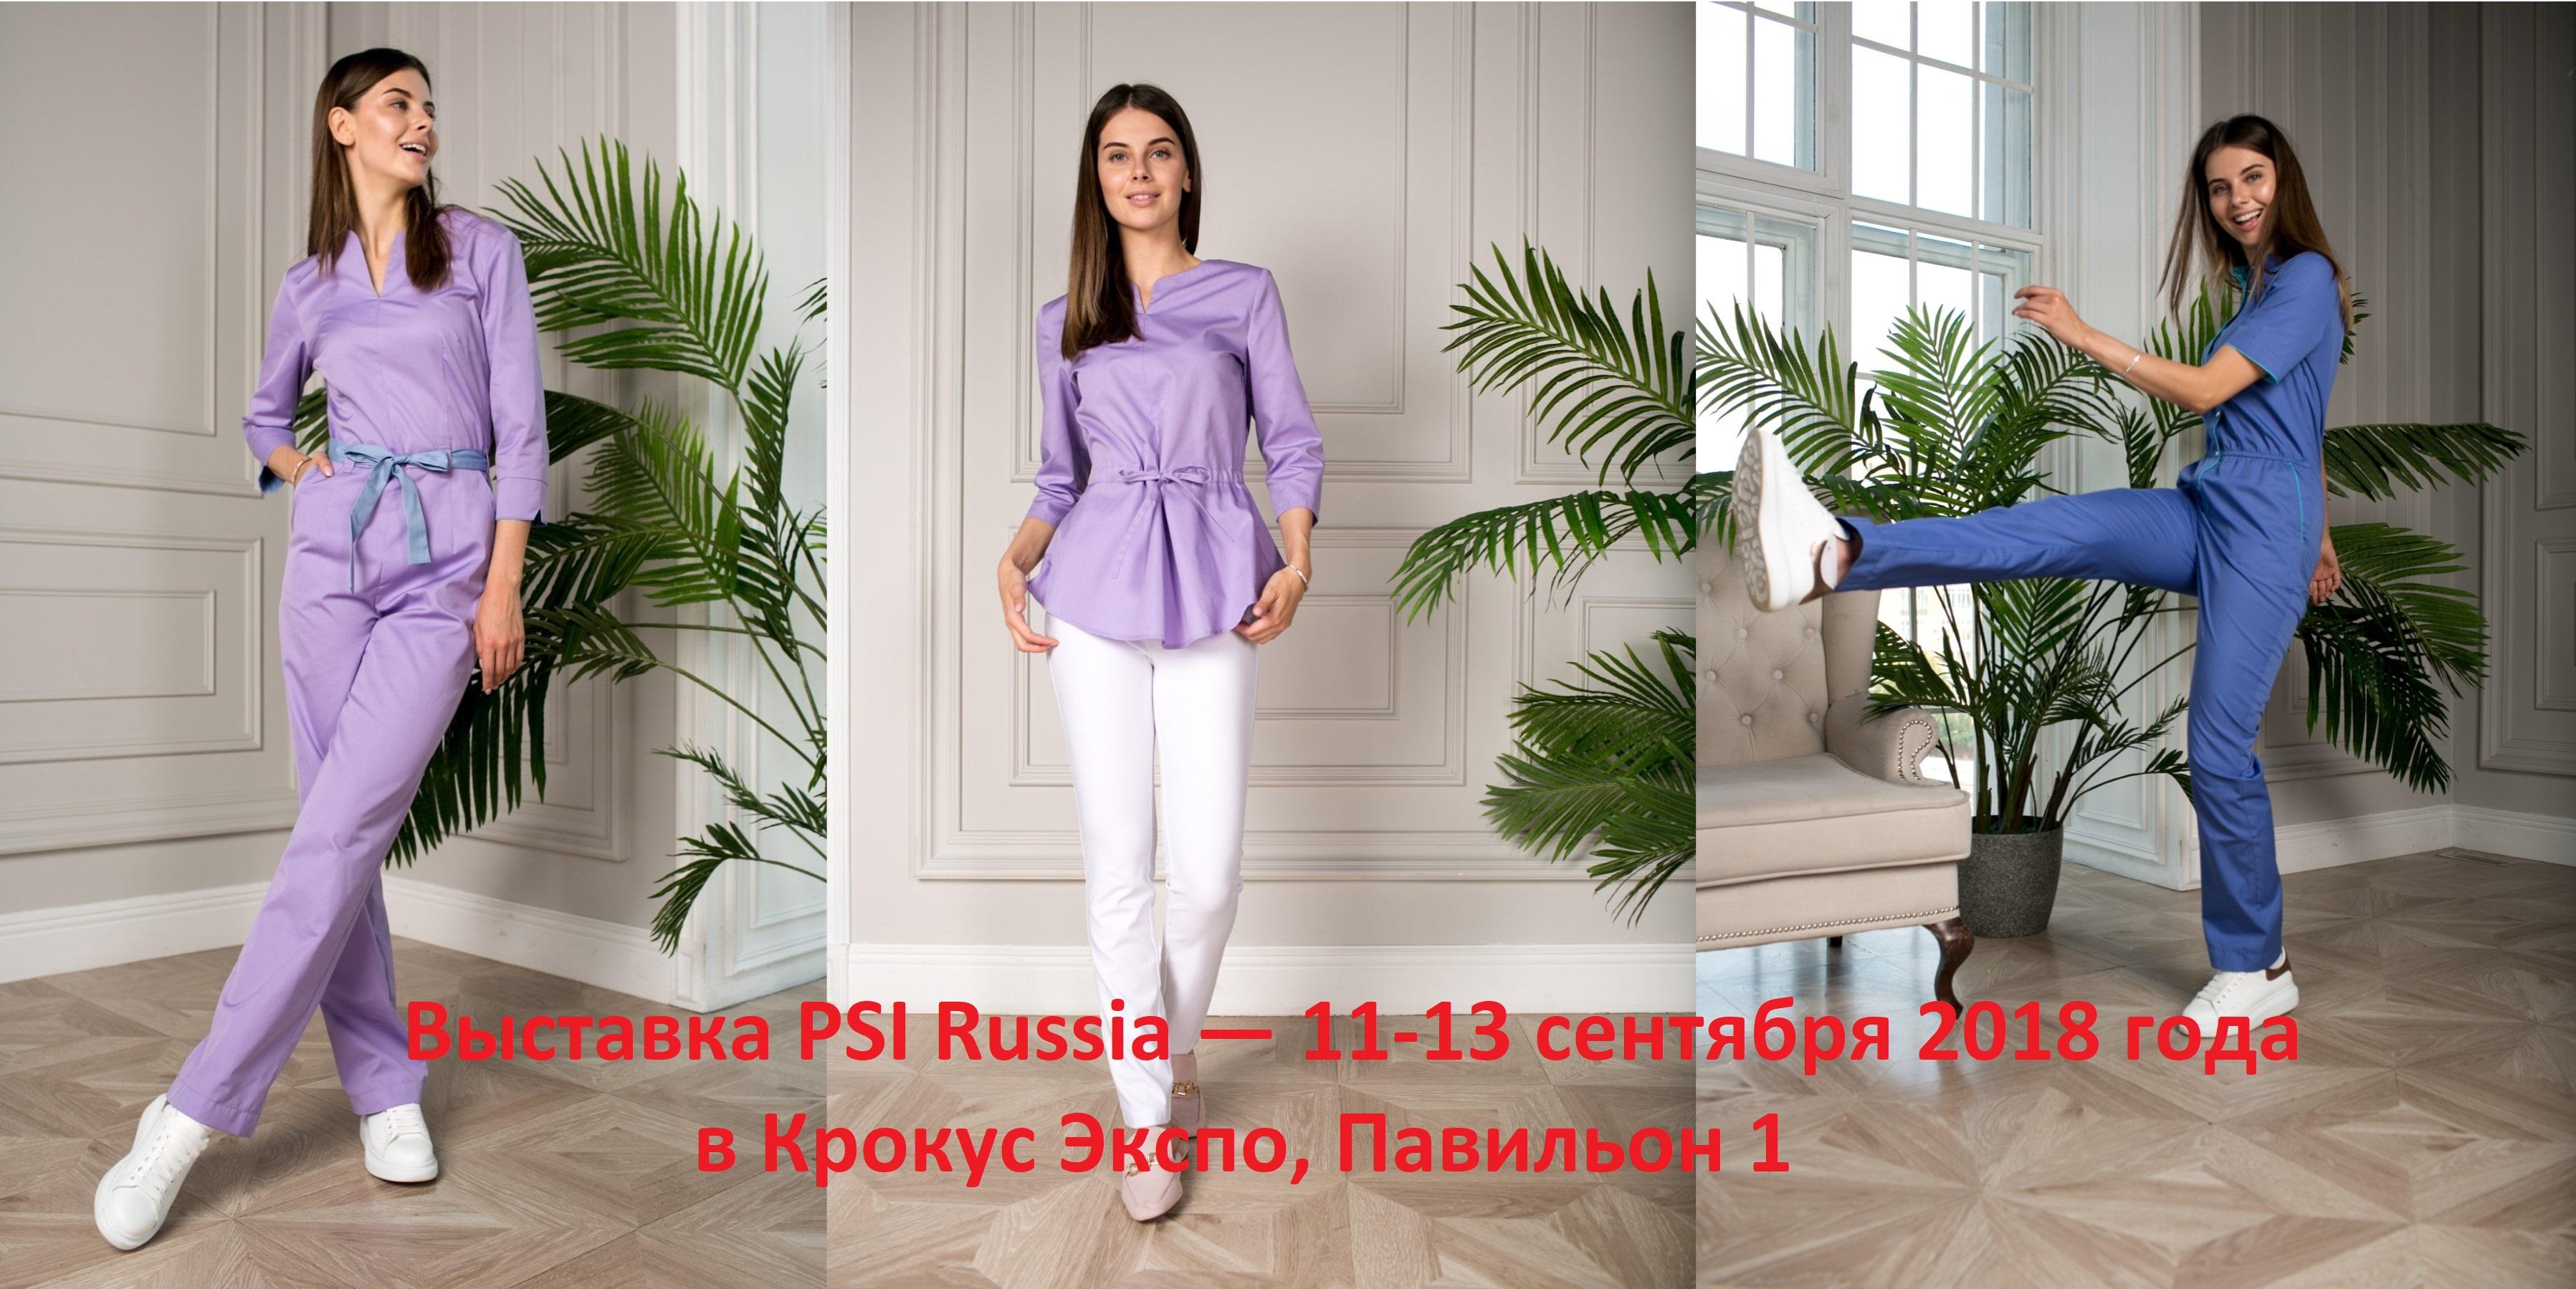 IPSA MOSCOW 2018 11-13 sept